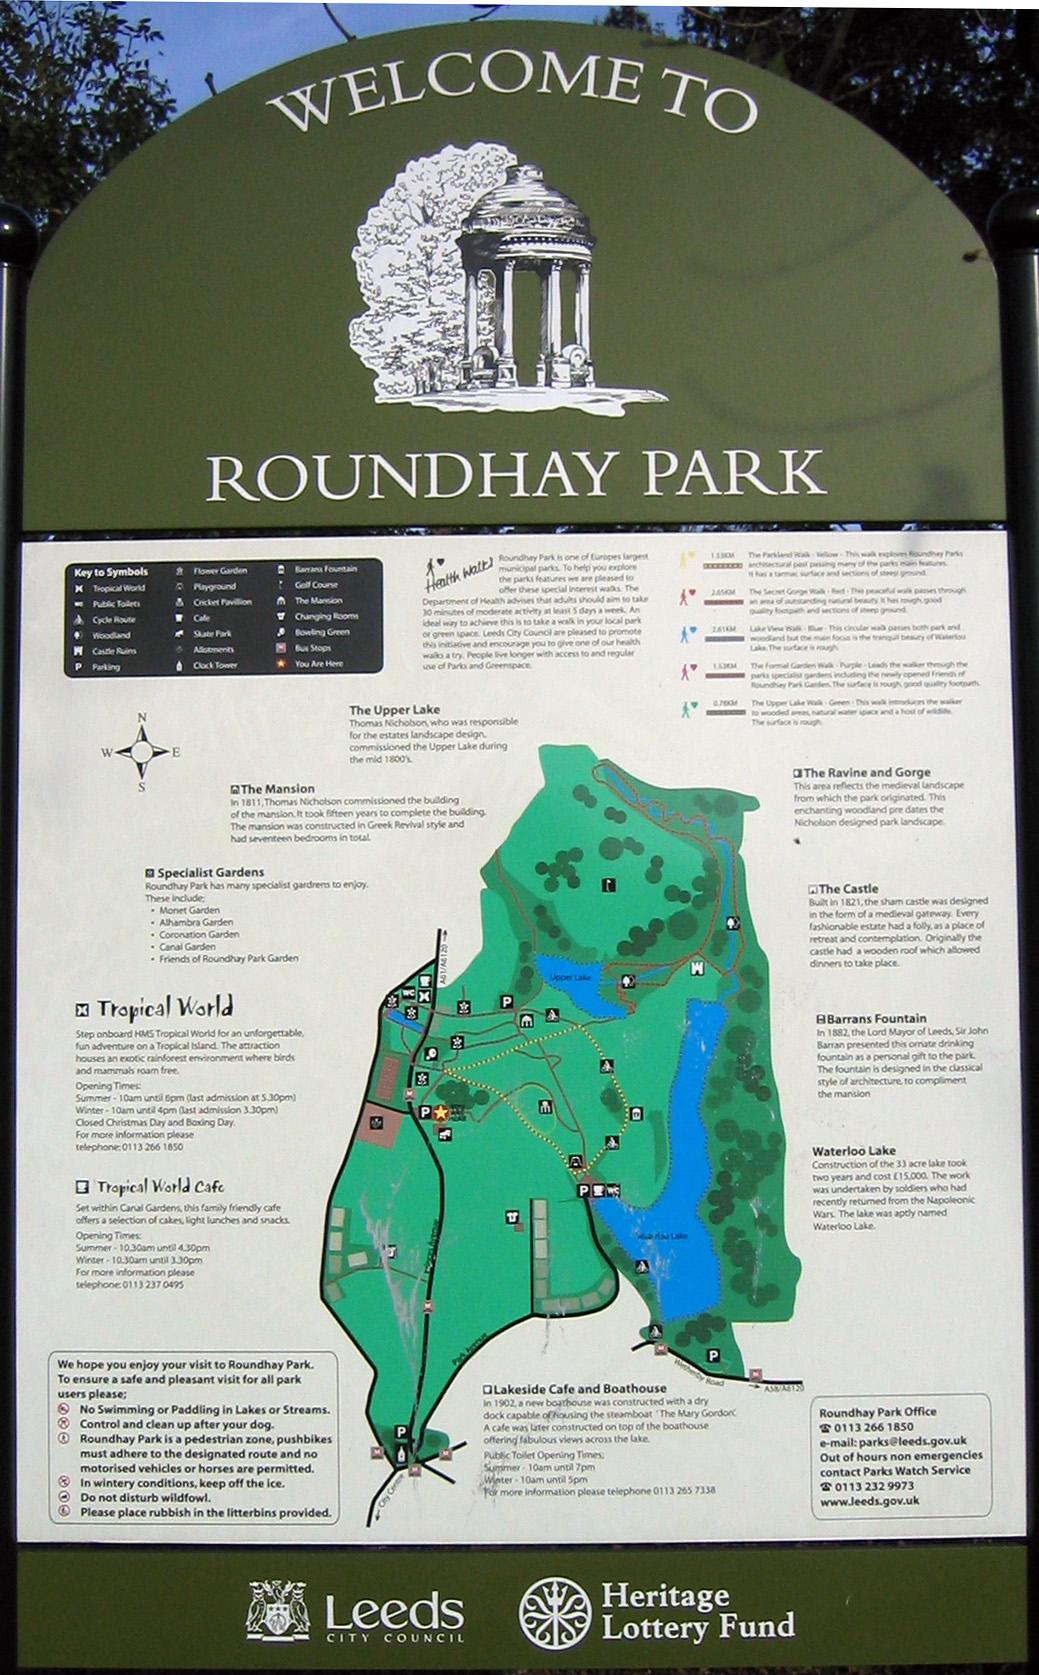 Roundhay Park - Wikipedia